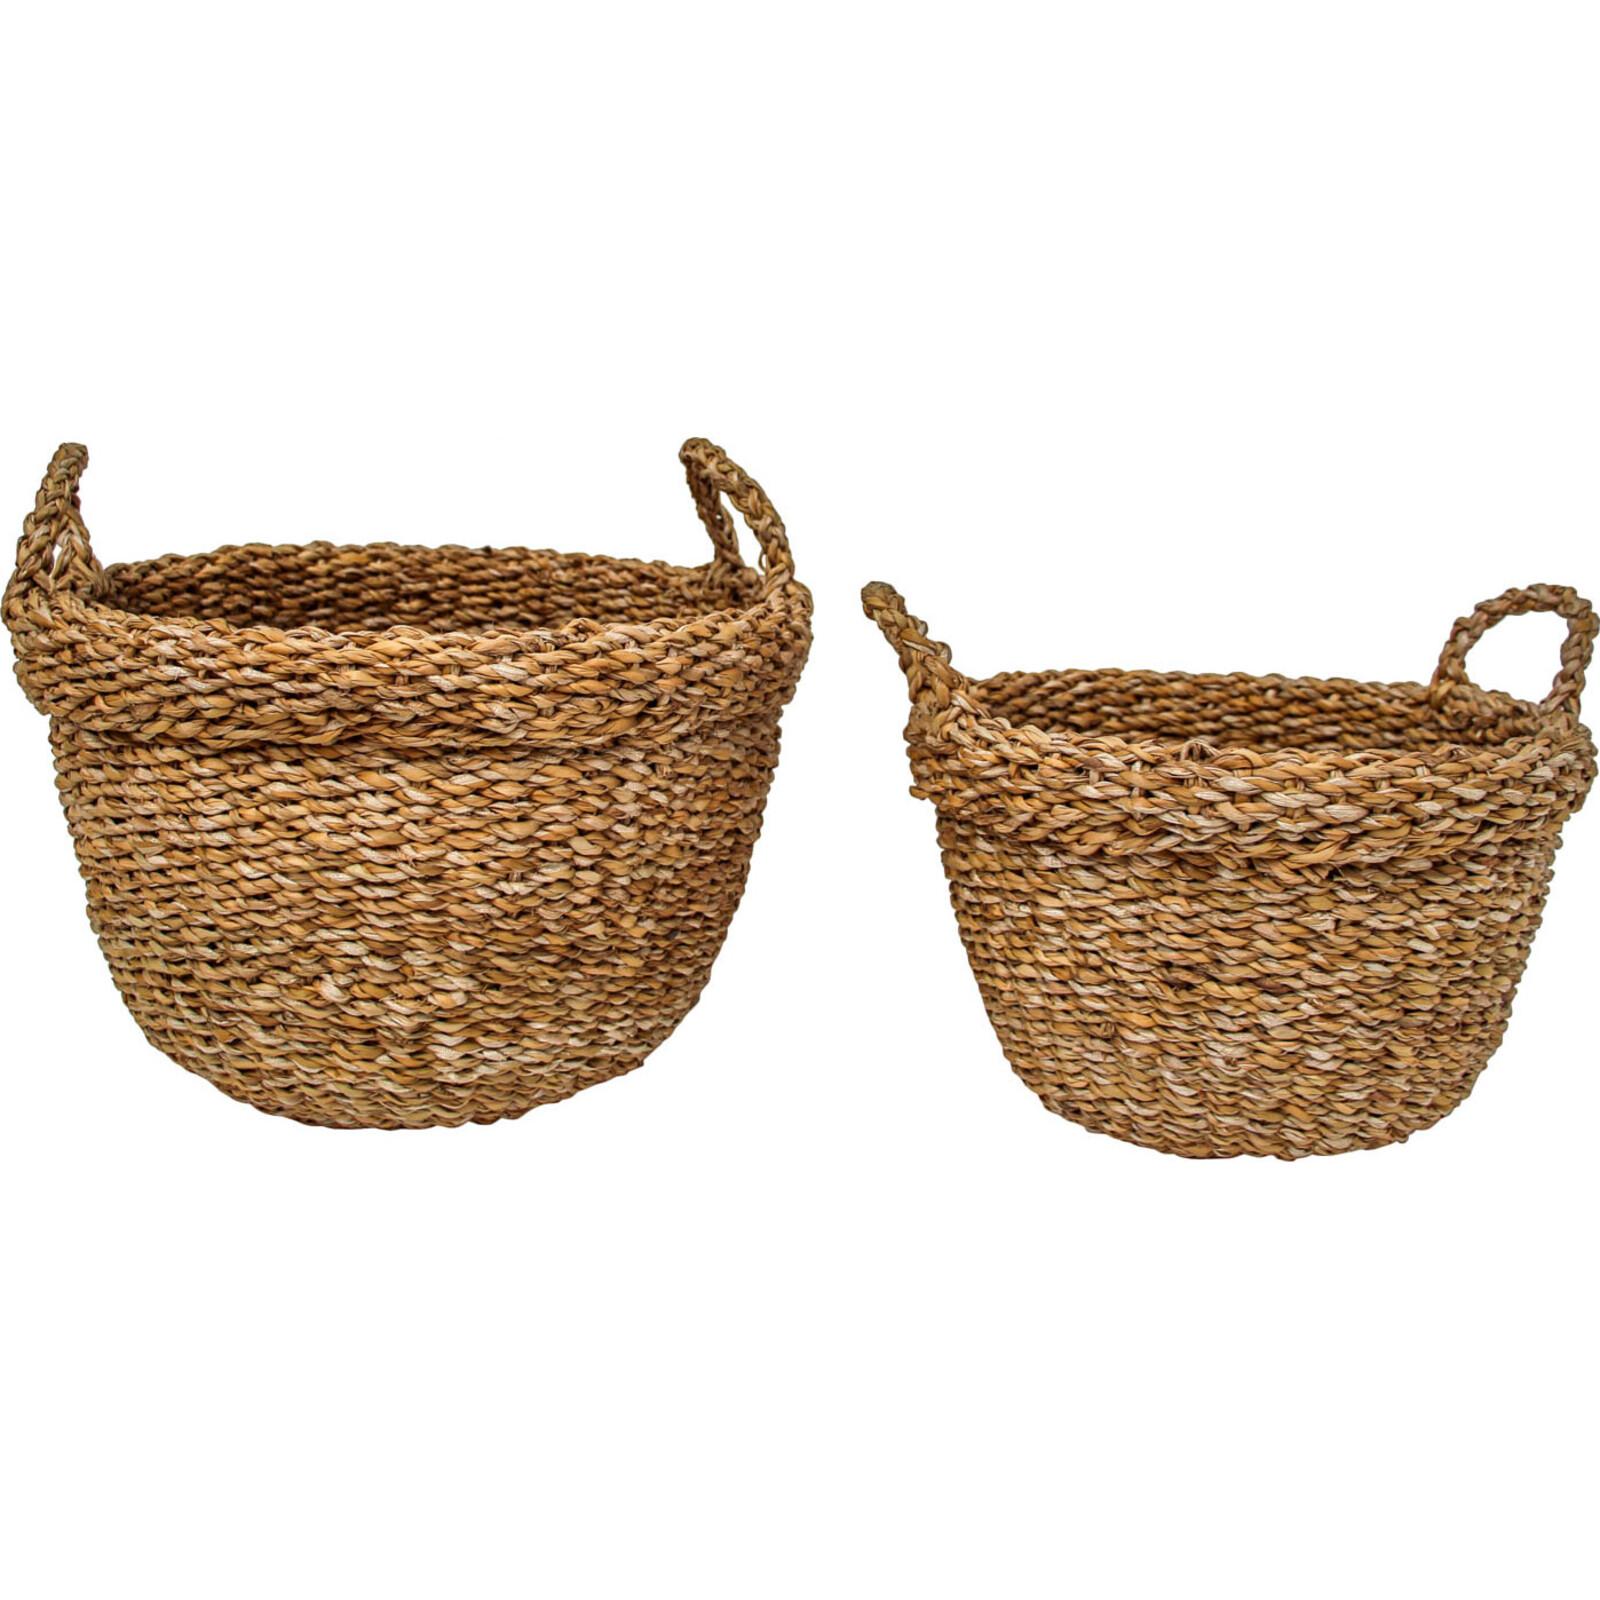 Seagrass S/2 Tub Basket Fold